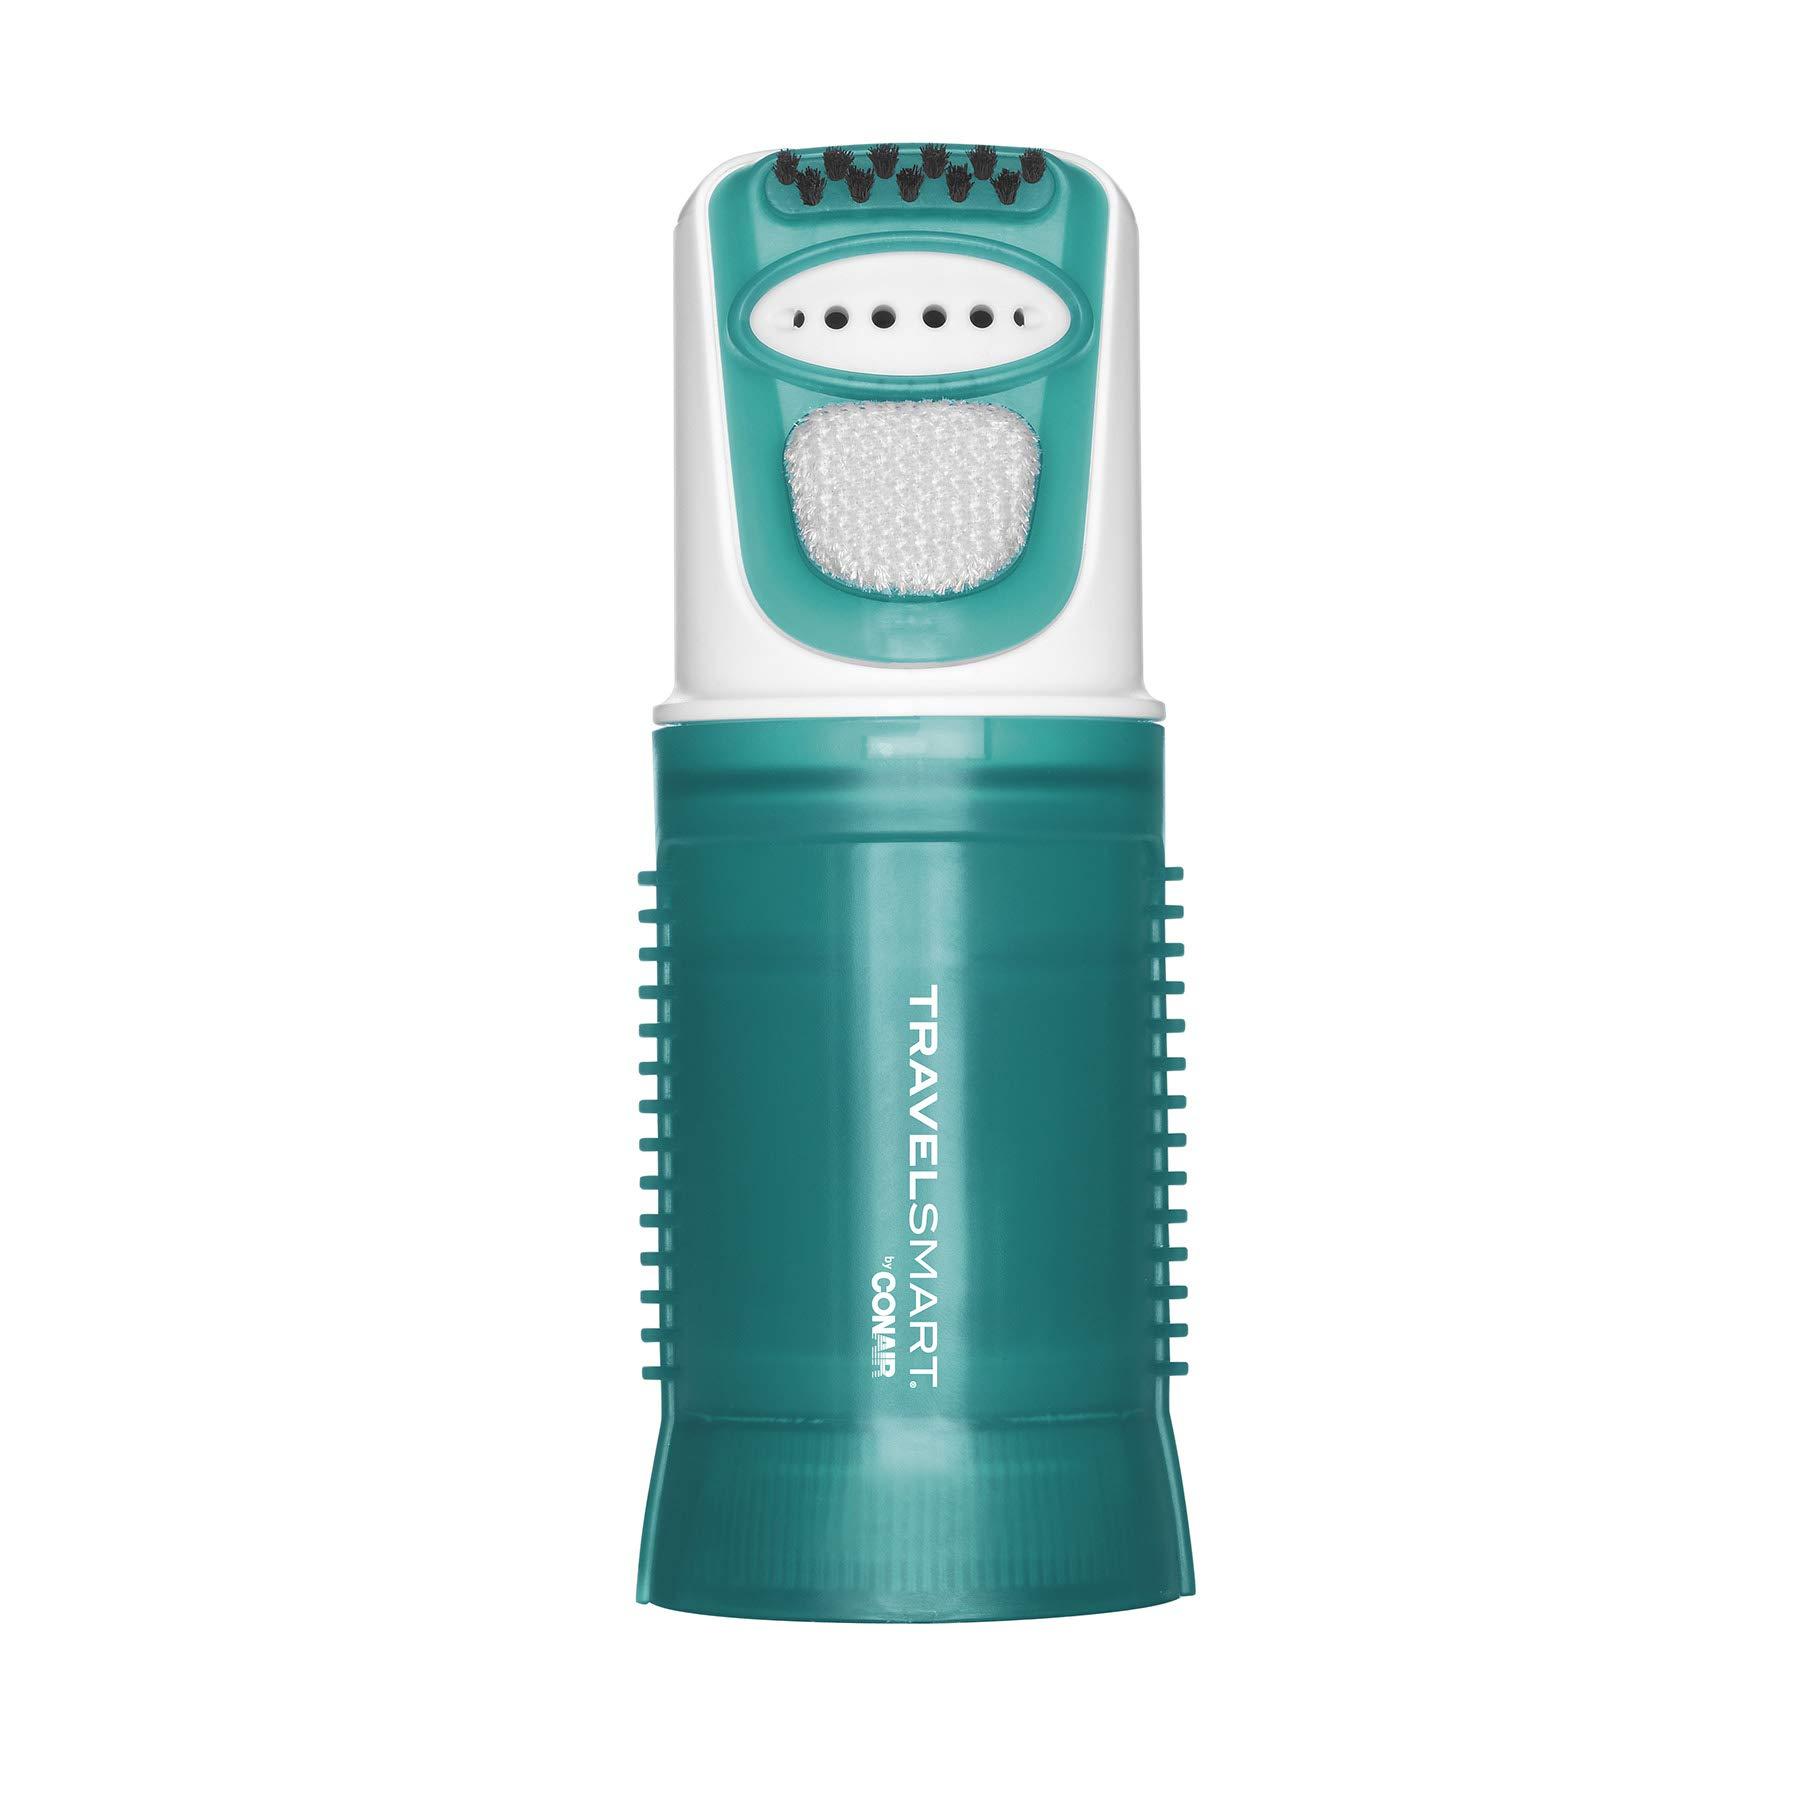 Conair Travel Smart by 450 Watt Dual Voltage Garment Steamer, One Size, Green by Conair